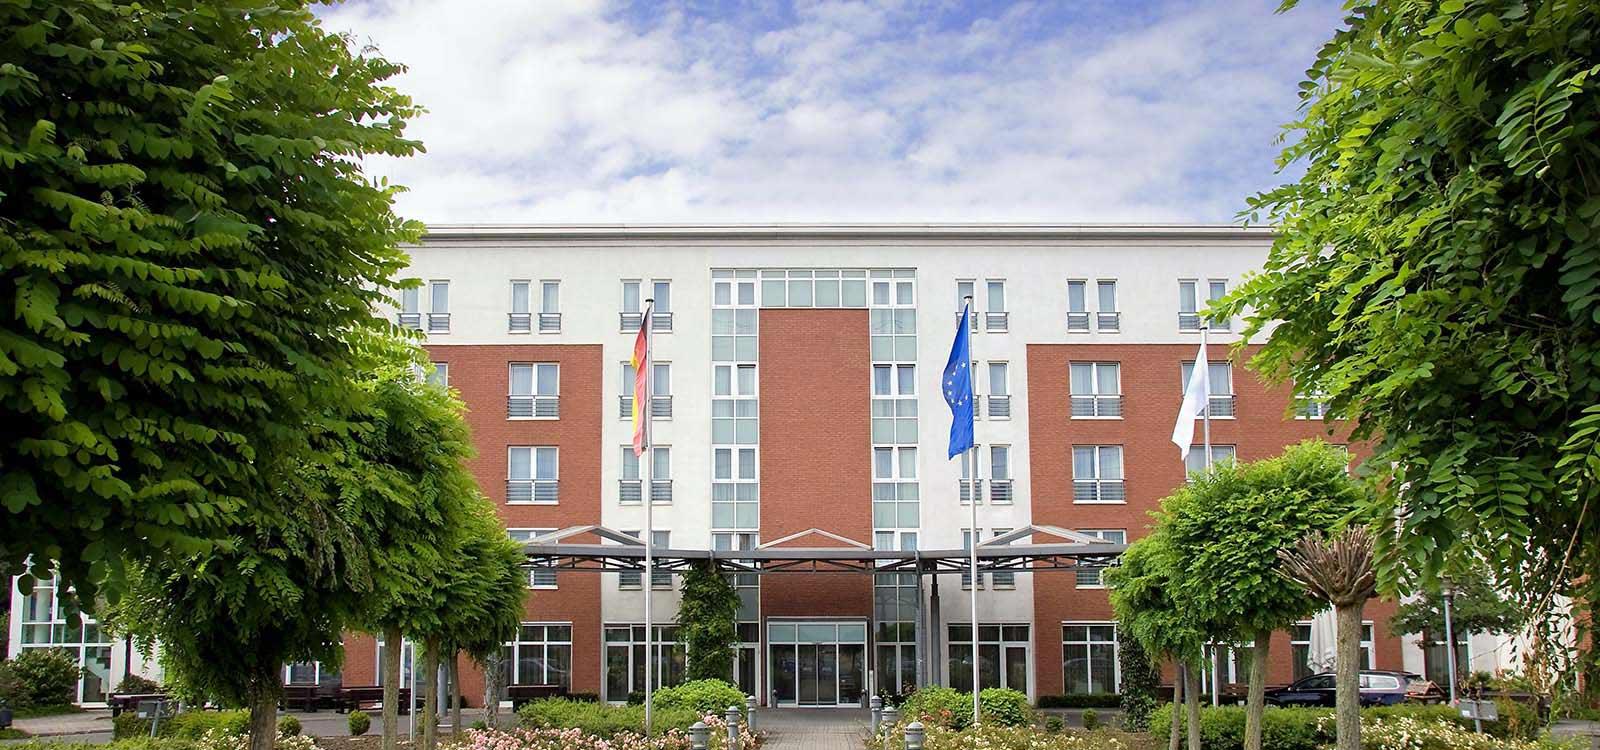 Mercure kamen unna event hotels intl markenhotellerie for Designhotel unna